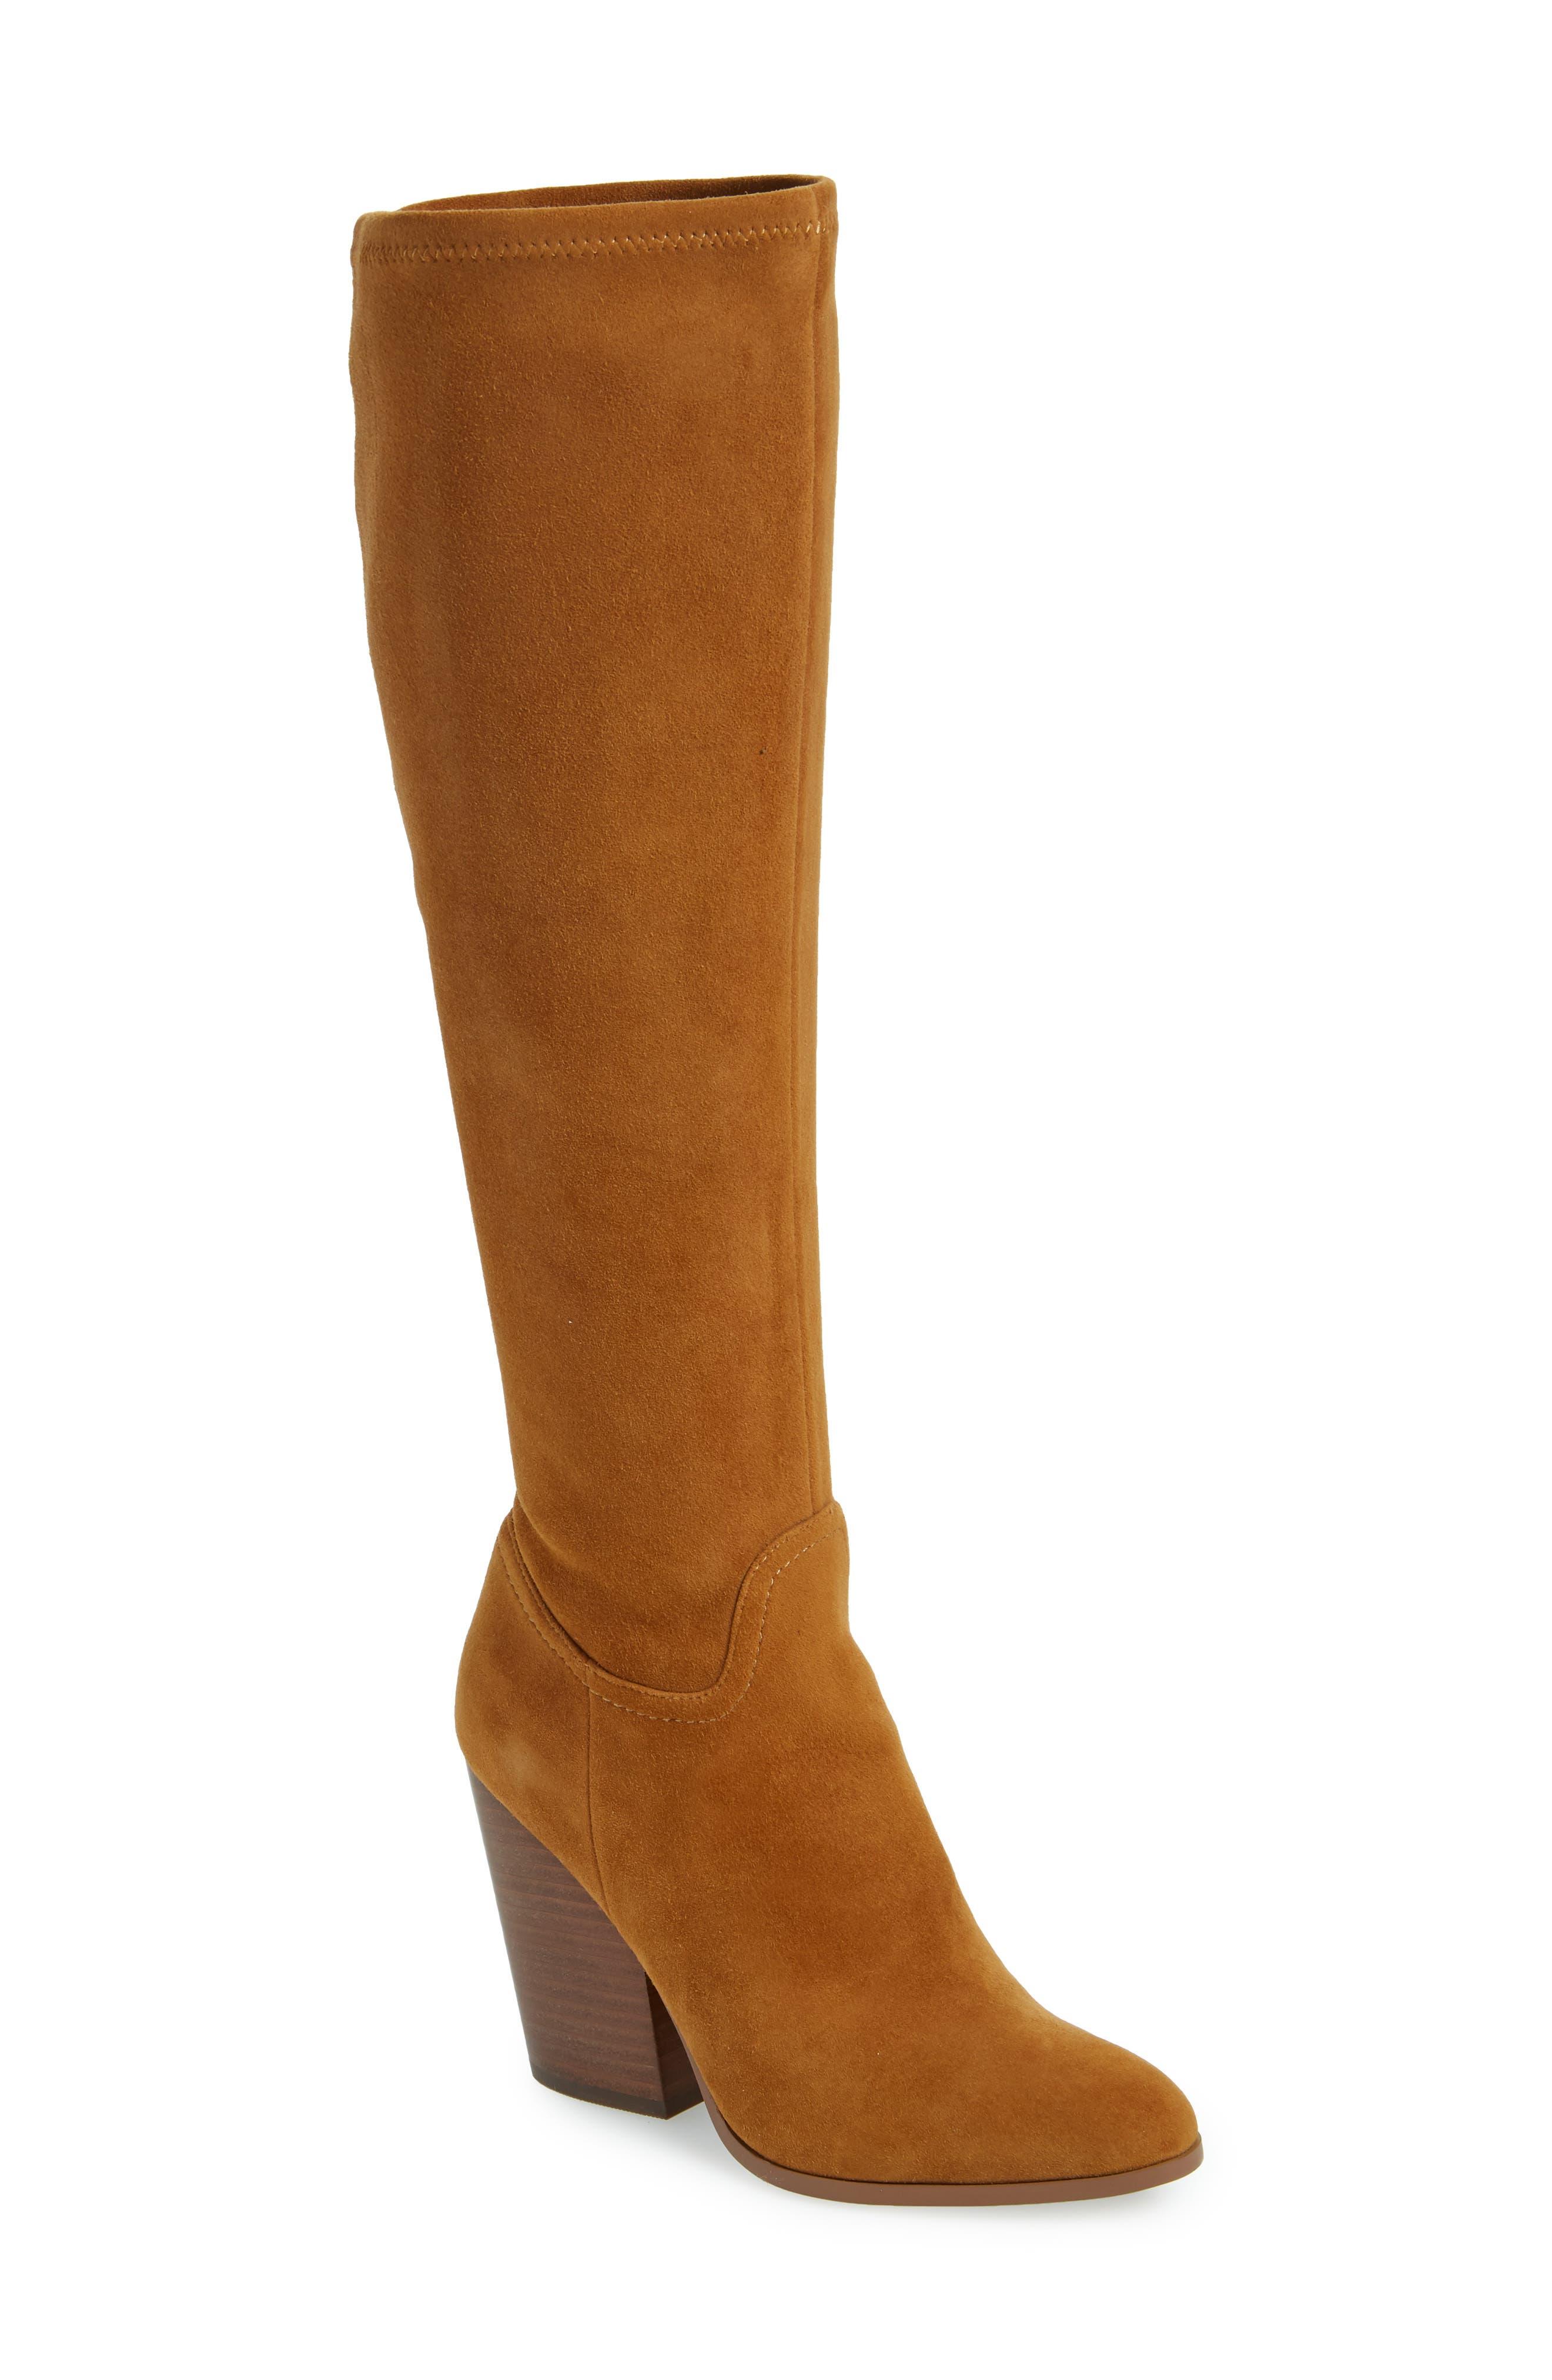 Linea Paolo Elena Knee High Boot, Beige